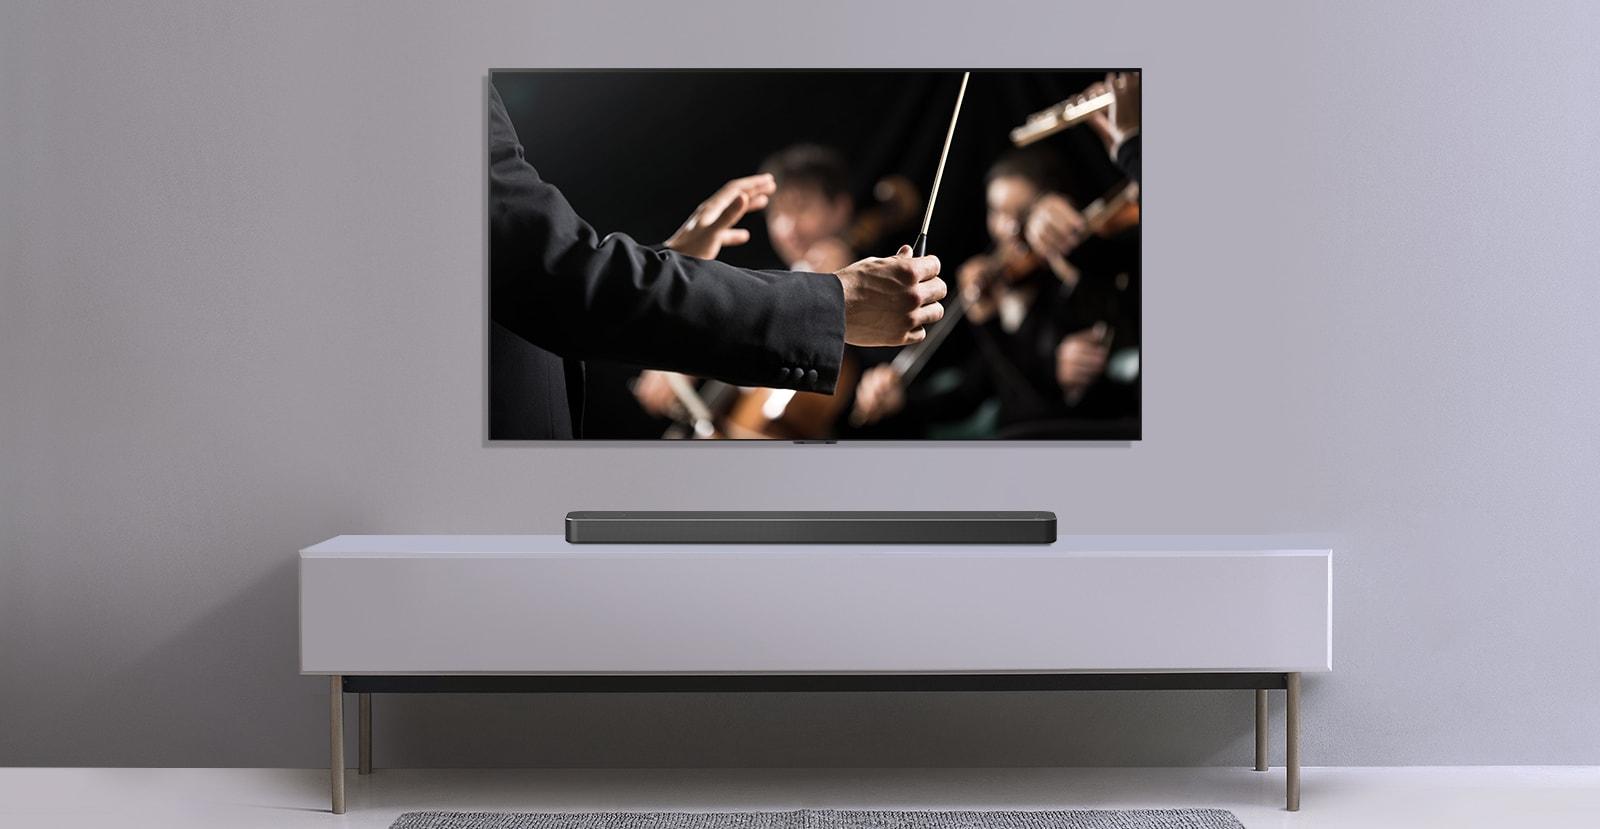 Na sivi steni je televizor, pod njim na sivi polici pa je zvočnik LG Sound Bar. Televizija prikazuje dirigenta, ki dirigira orkestru.